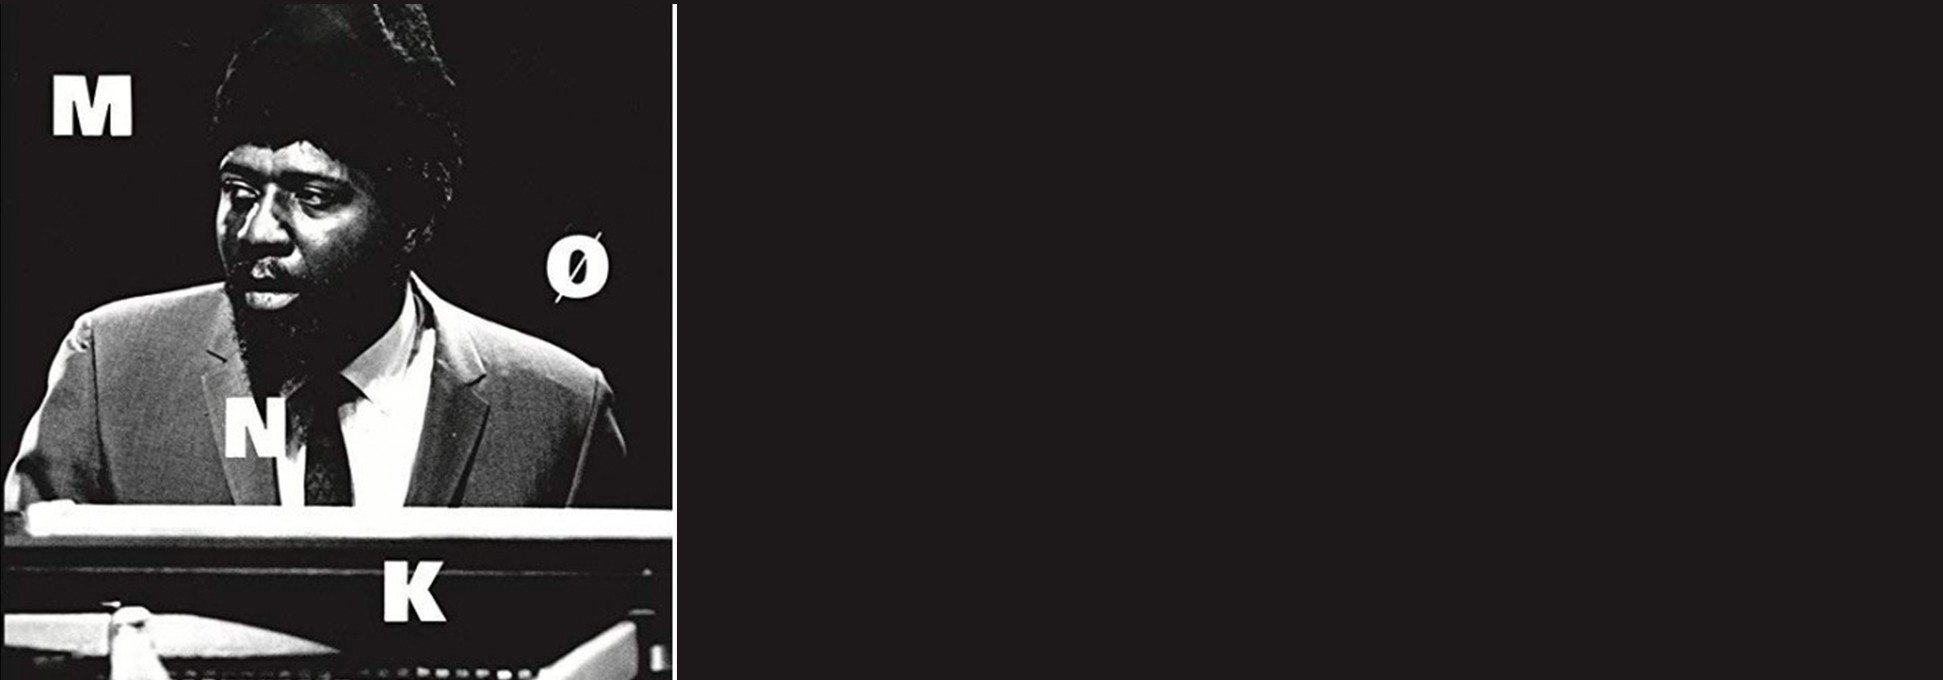 Thelonious Monk - Live In Copenhagen, 1963